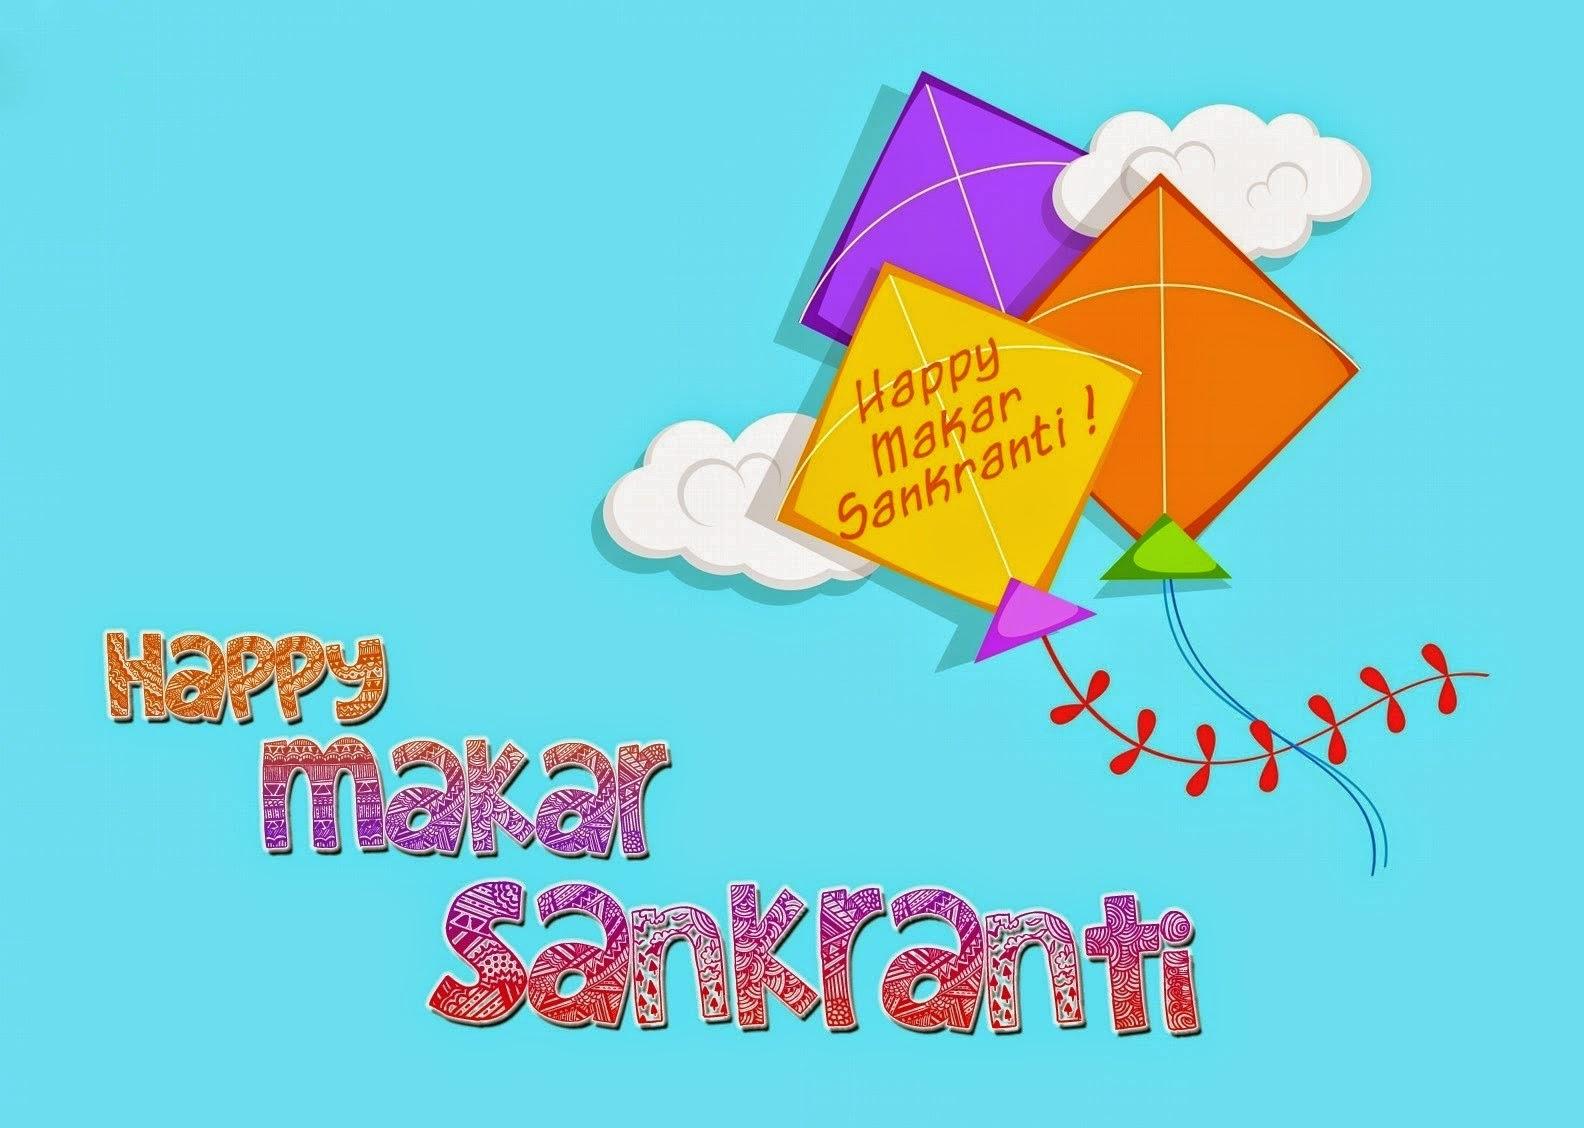 Happy Makar Sankranti Whatsapp Status and messages